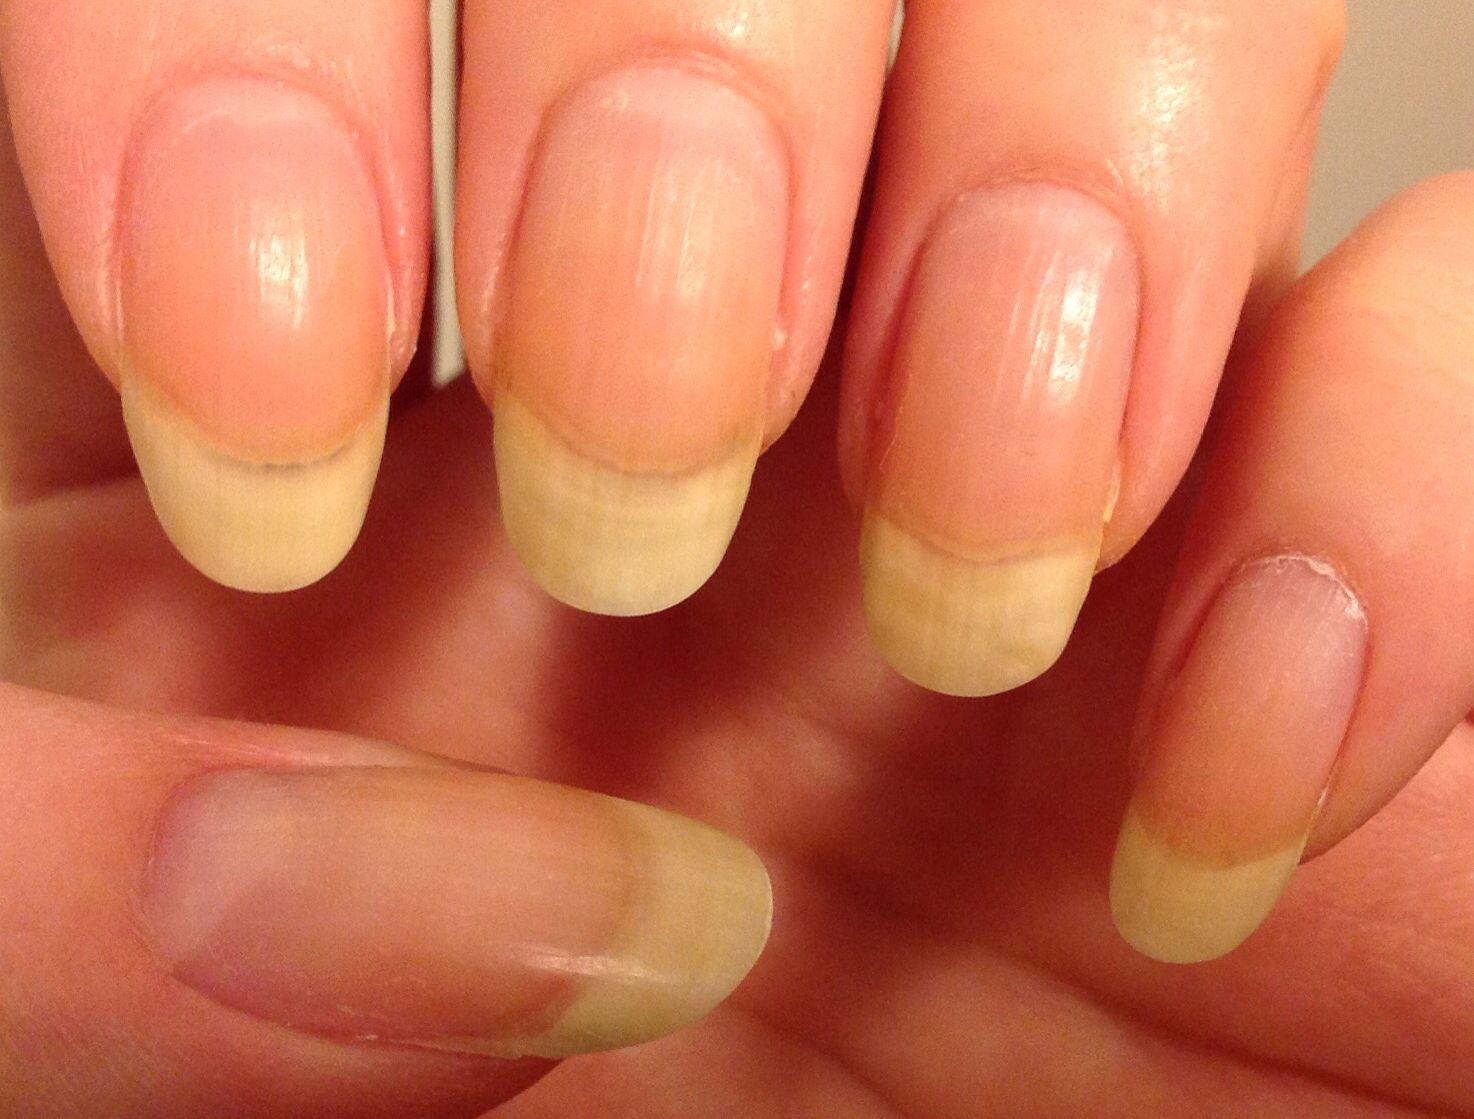 March 5th Left hand | Nail growth progress | Pinterest